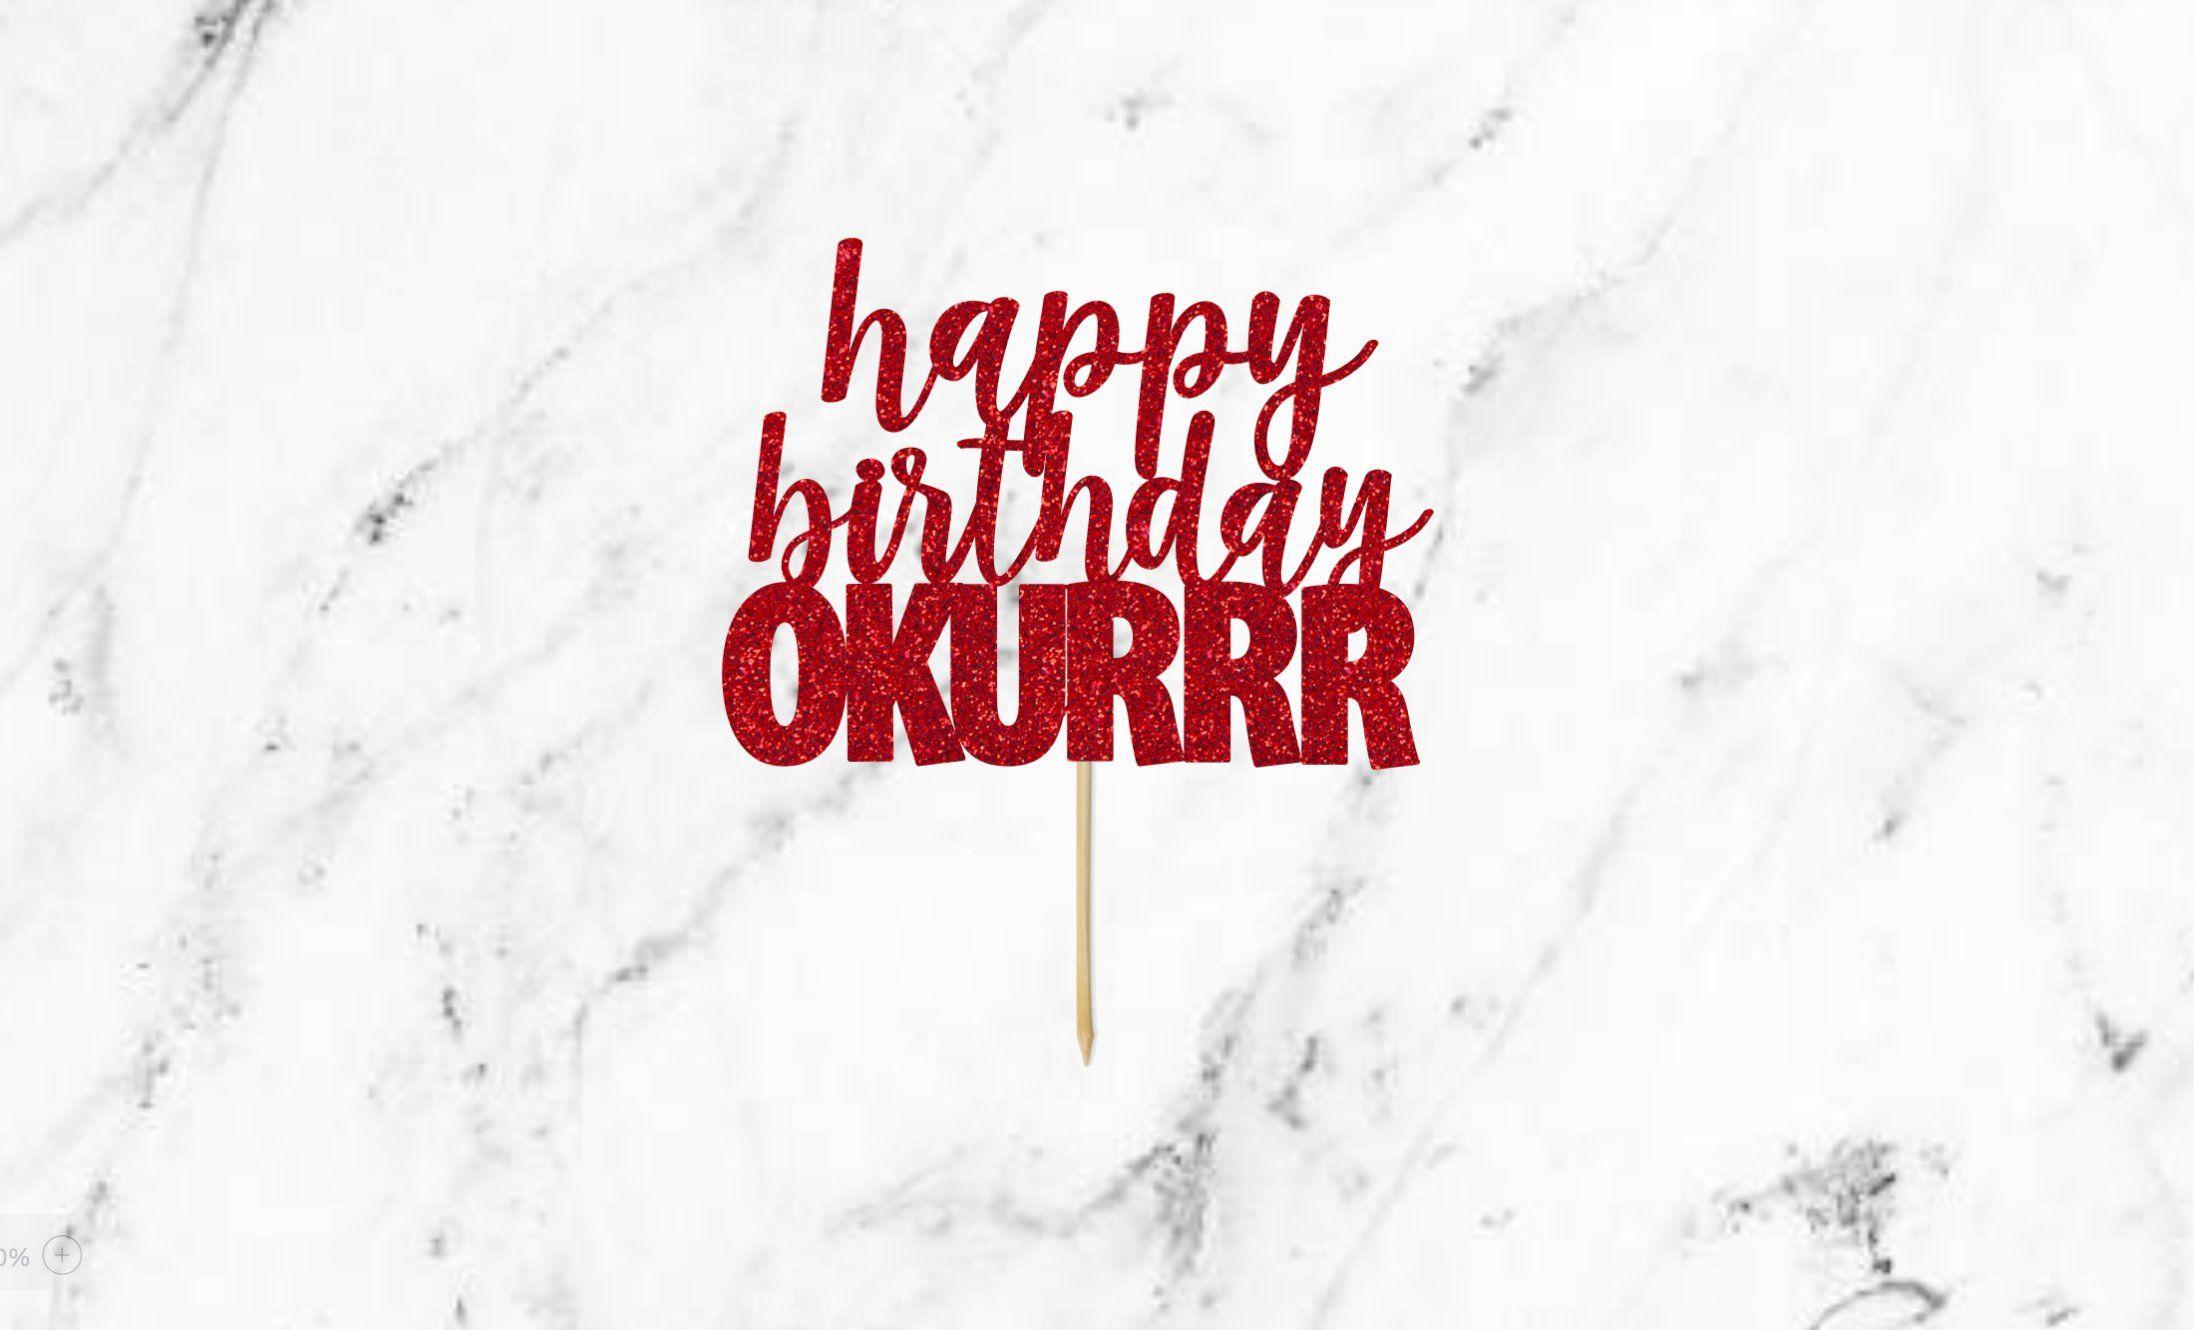 Happy Birthday Okurrr Cake Topper Cardi B Cake Topper